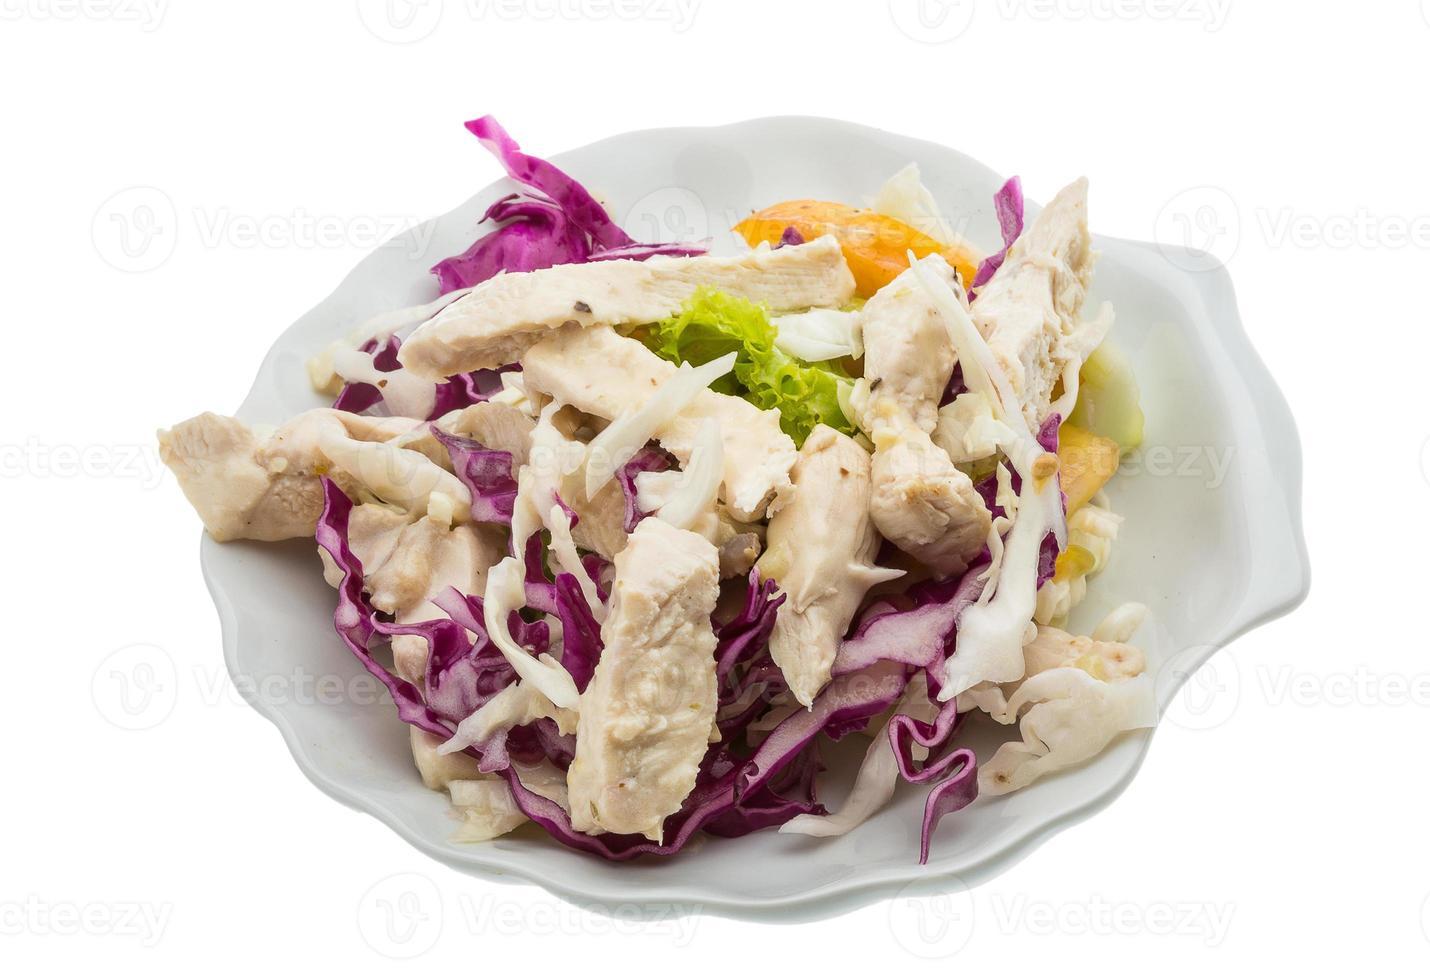 ensalada de pollo foto